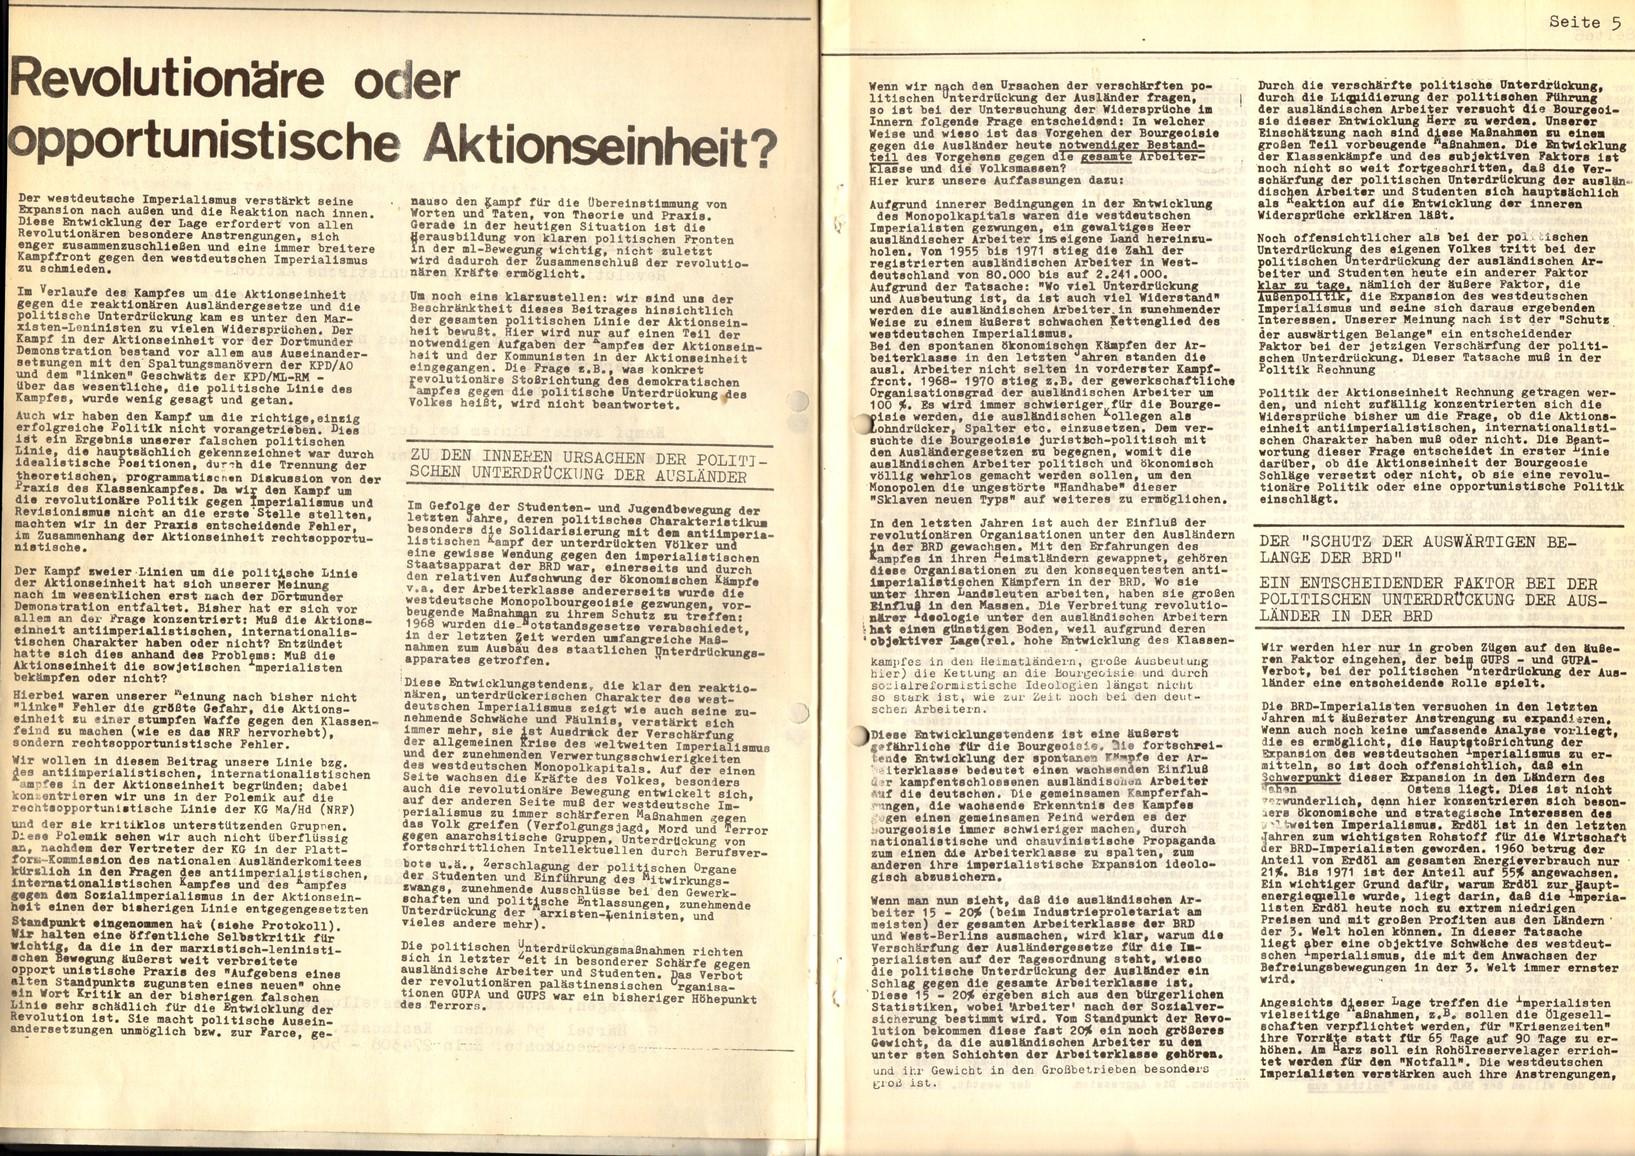 Aachen_Beitraege_revolutionaere_Politik_1973_01_03